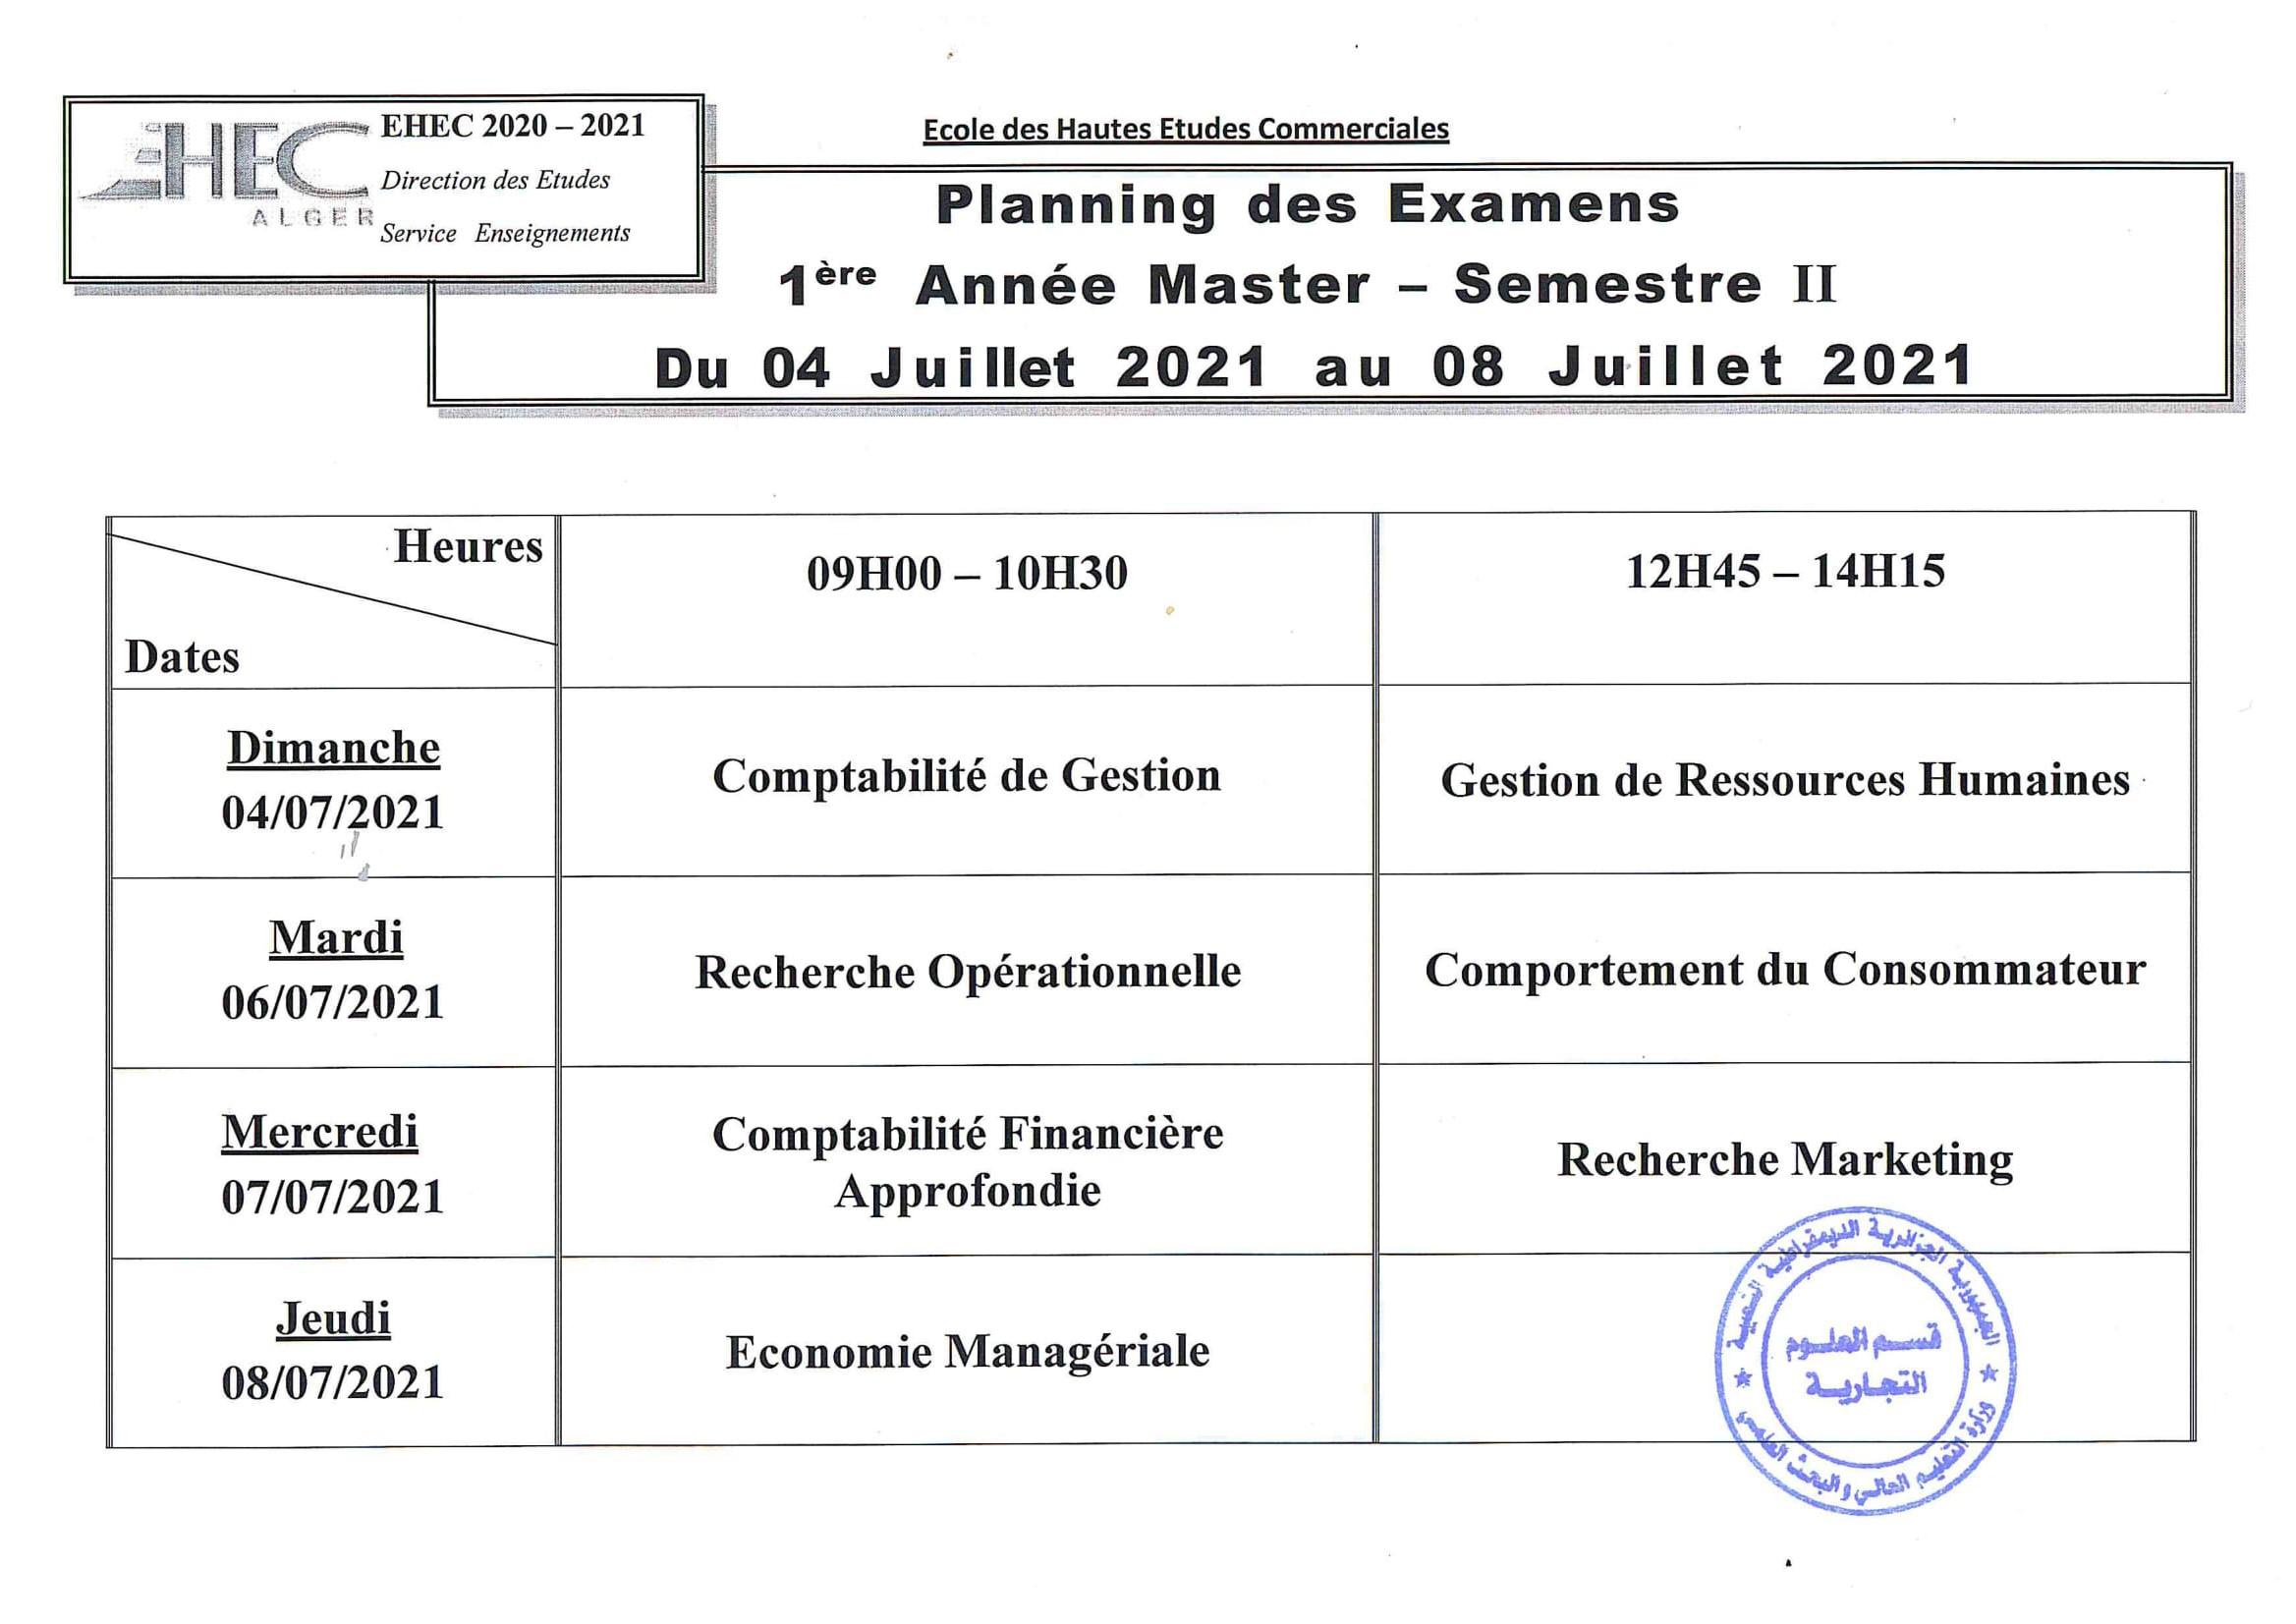 Planning des examens du cycle Master S2.